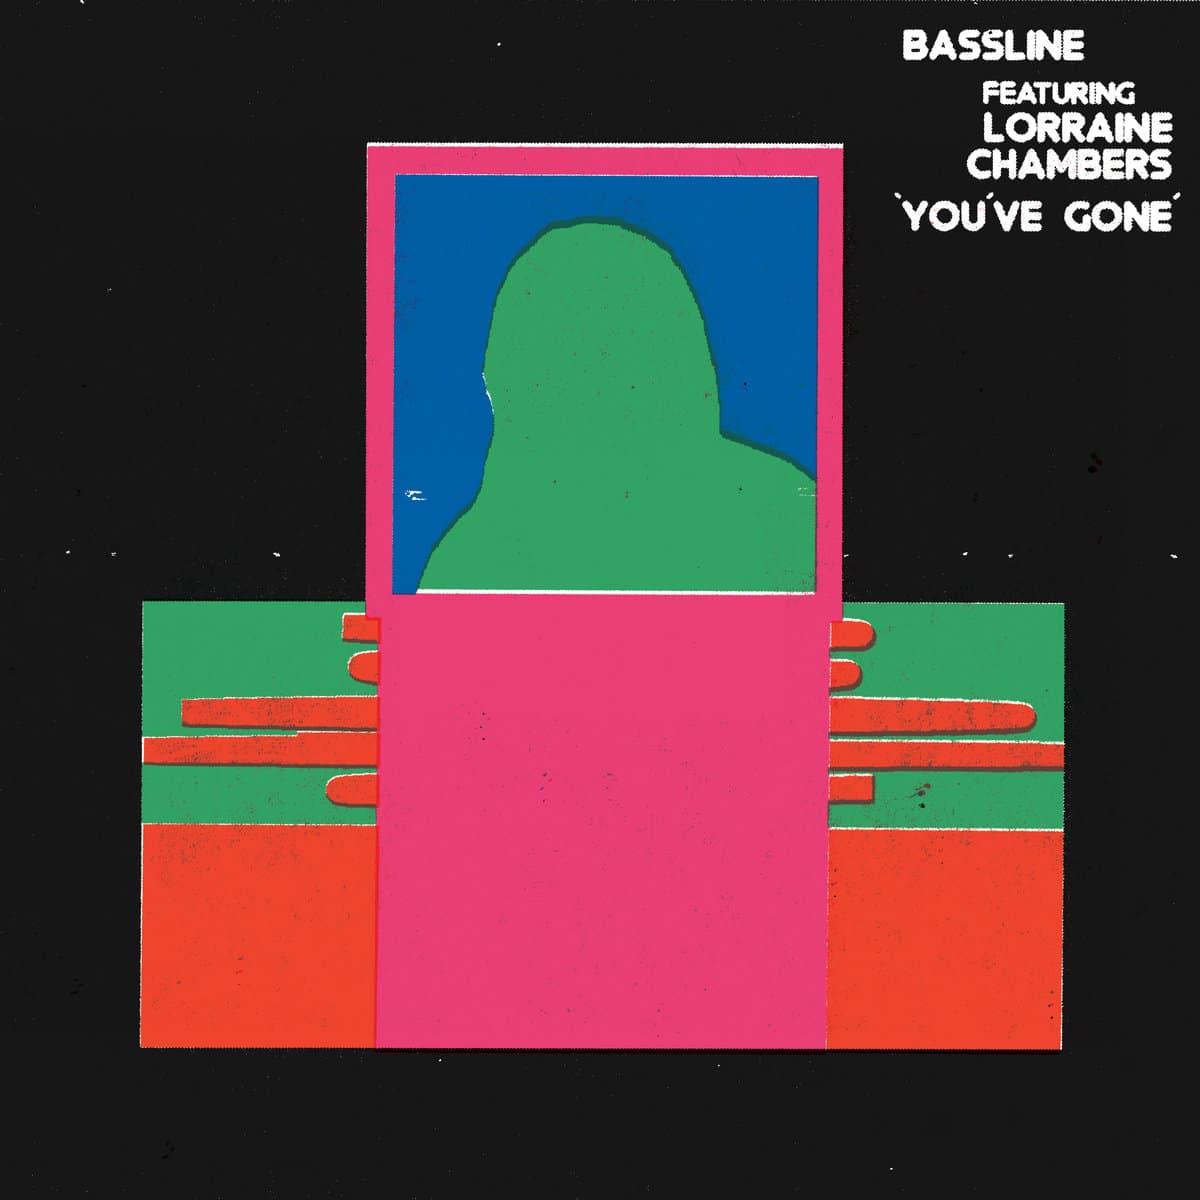 Baseline feat. Lorraine Chambers - You've Gone